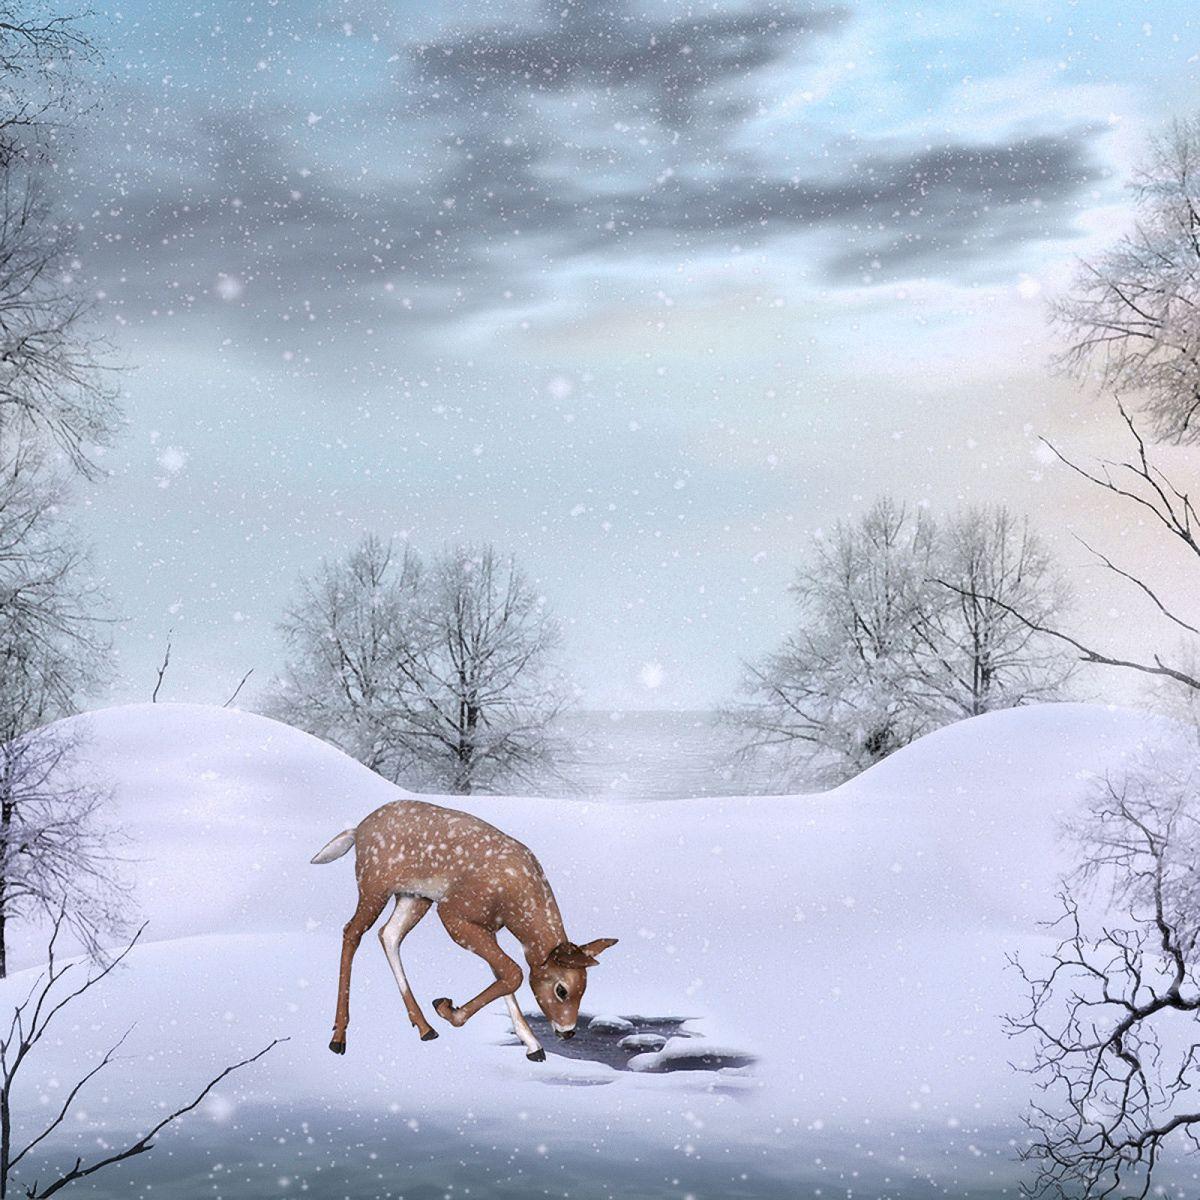 Winter Wallpaper: Cute Winter Backgrounds